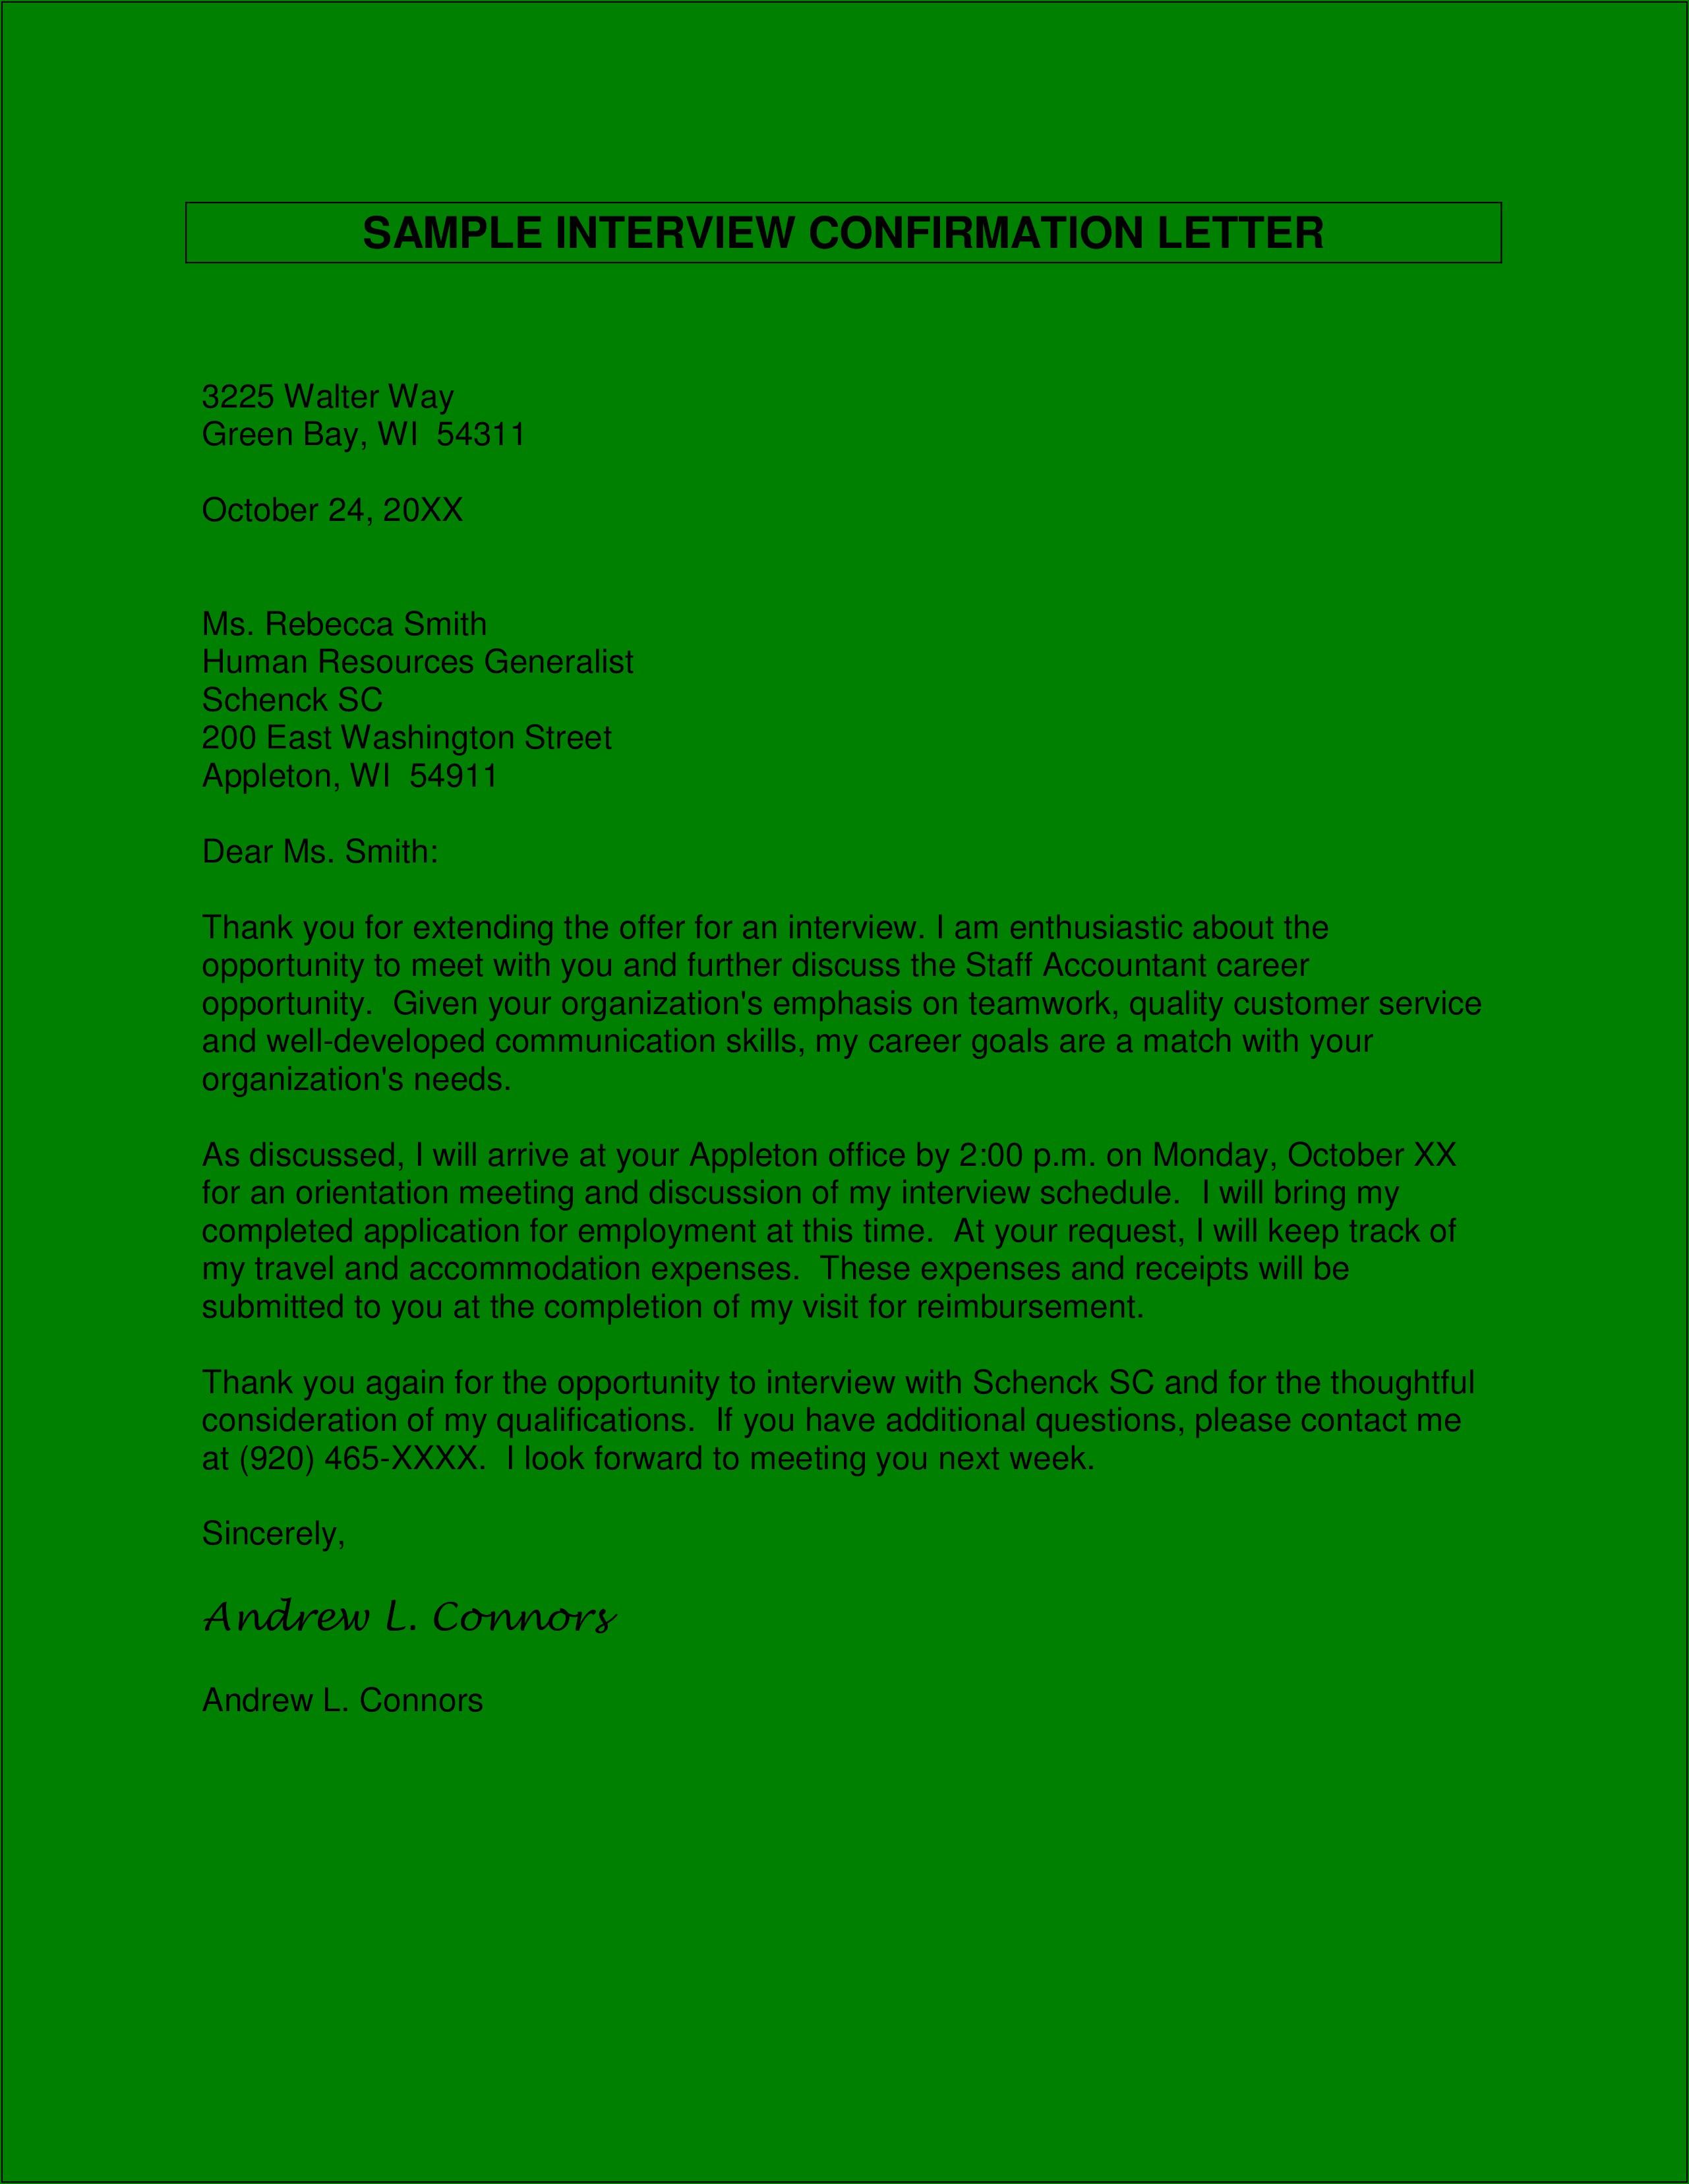 Invitation Confirmation Letter Template